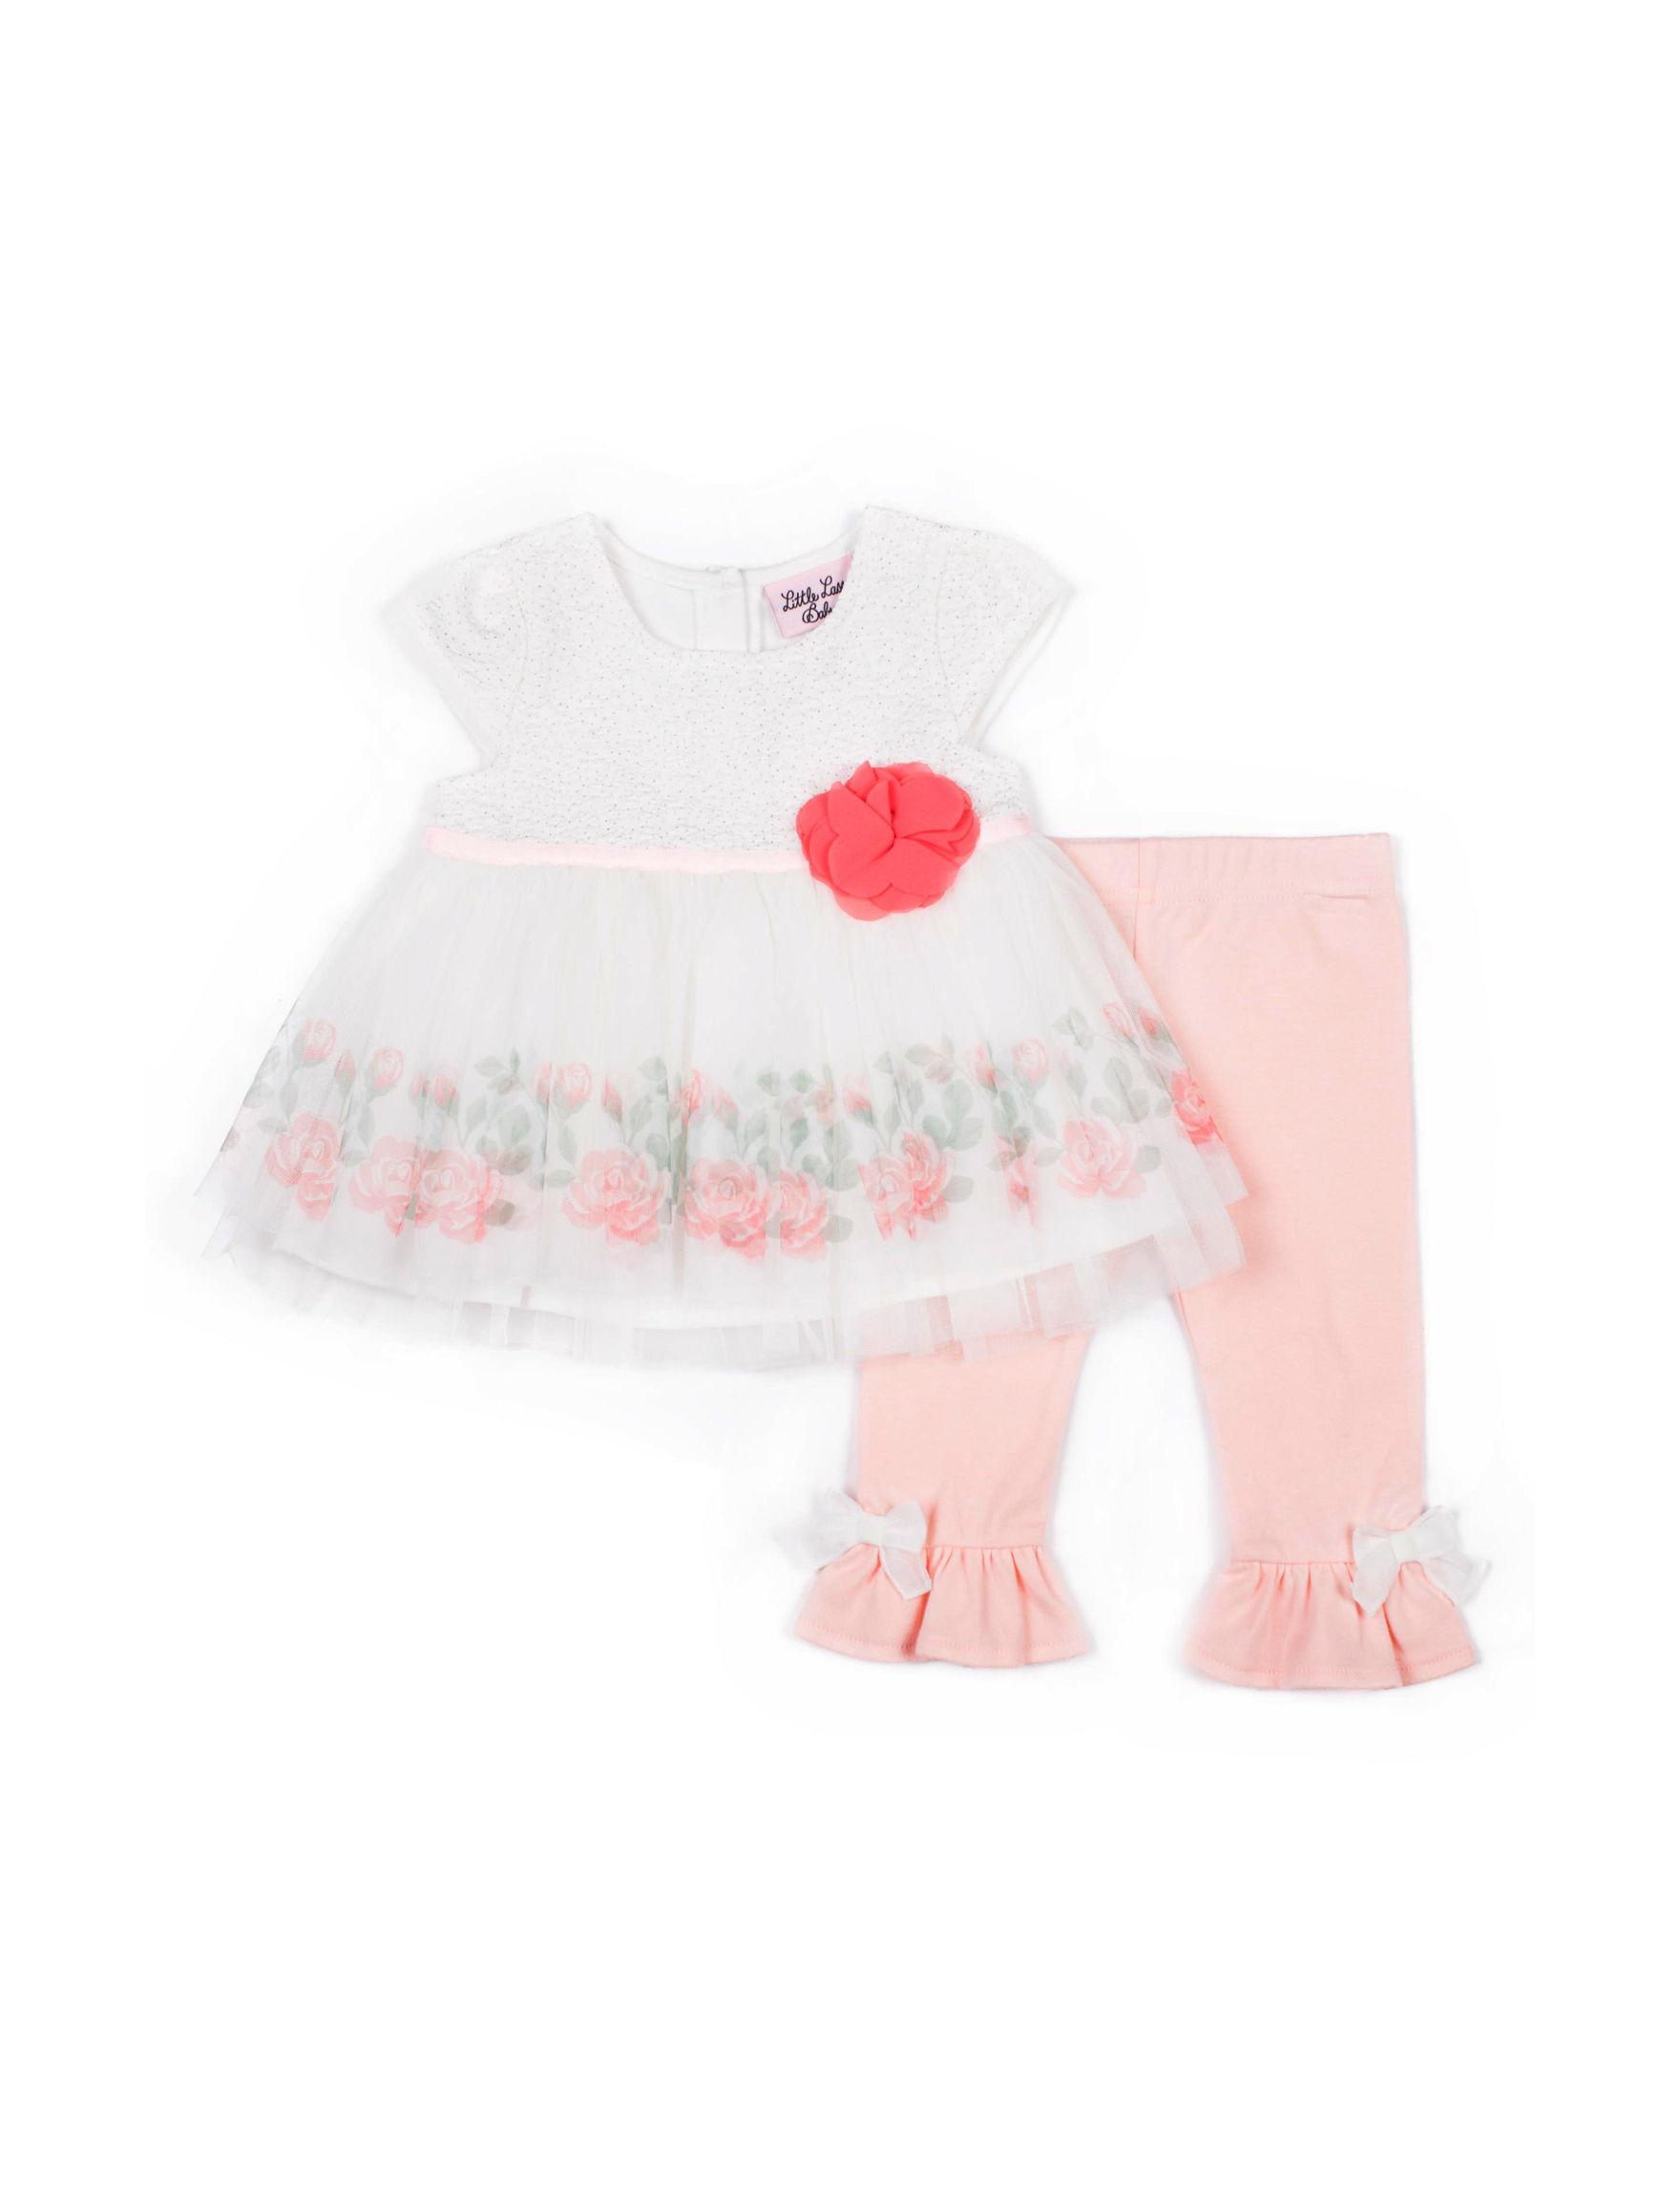 Little Lass Ivory / Pink